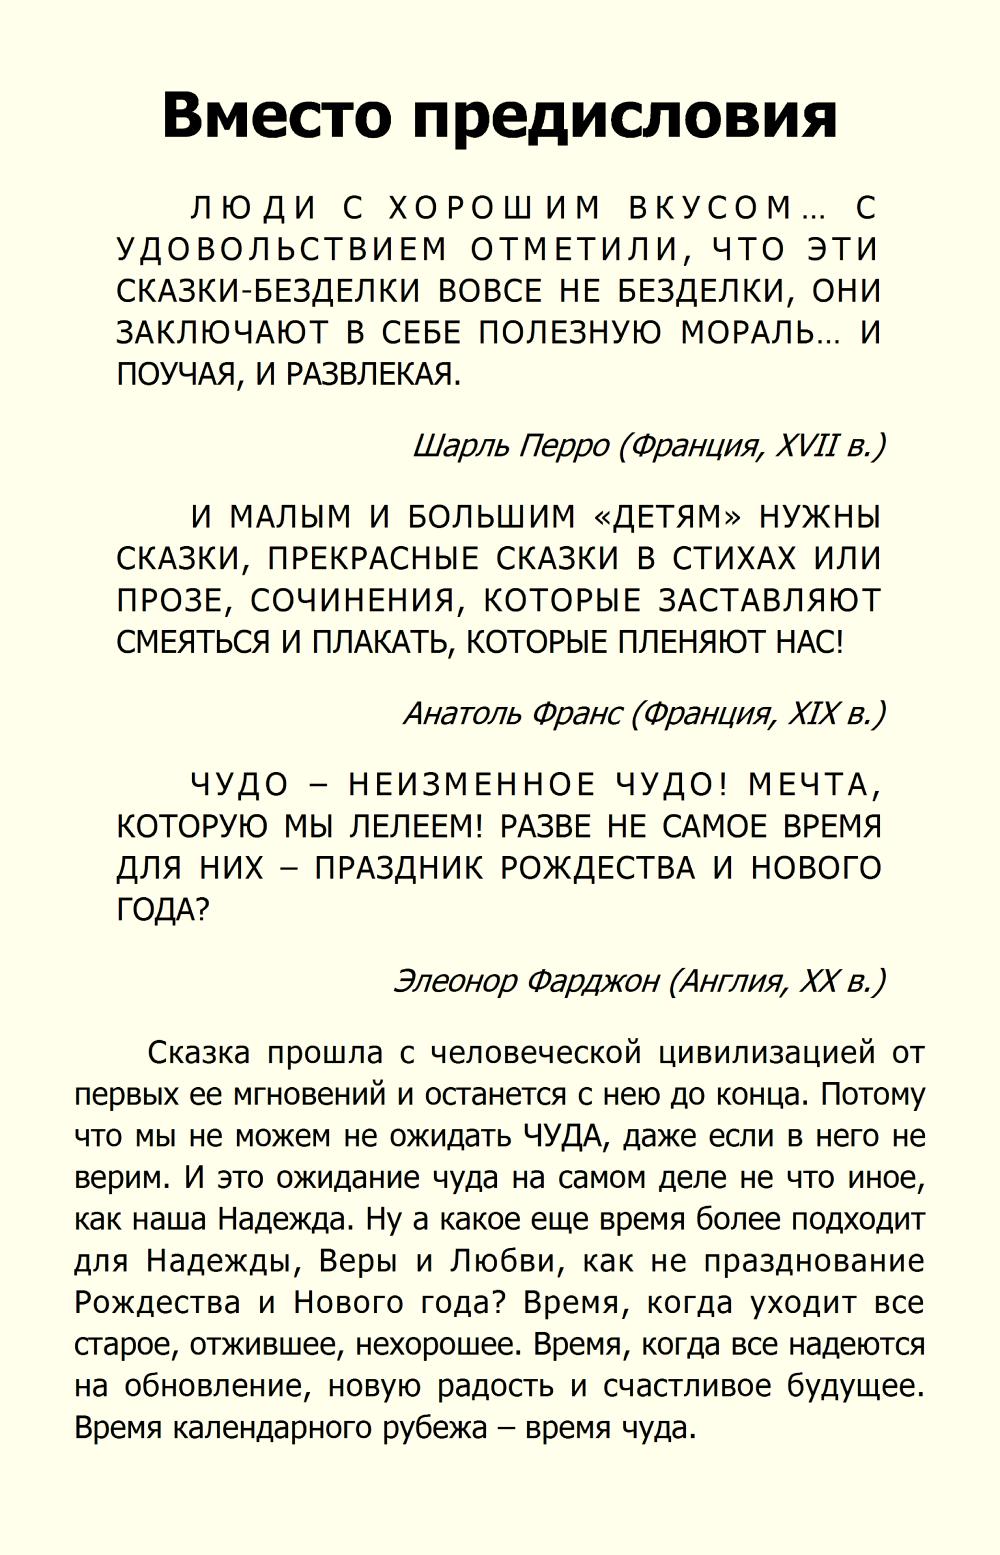 http://i4.imageban.ru/out/2014/01/25/7bfb88eacb945fb16fce10418dd59f20.jpg